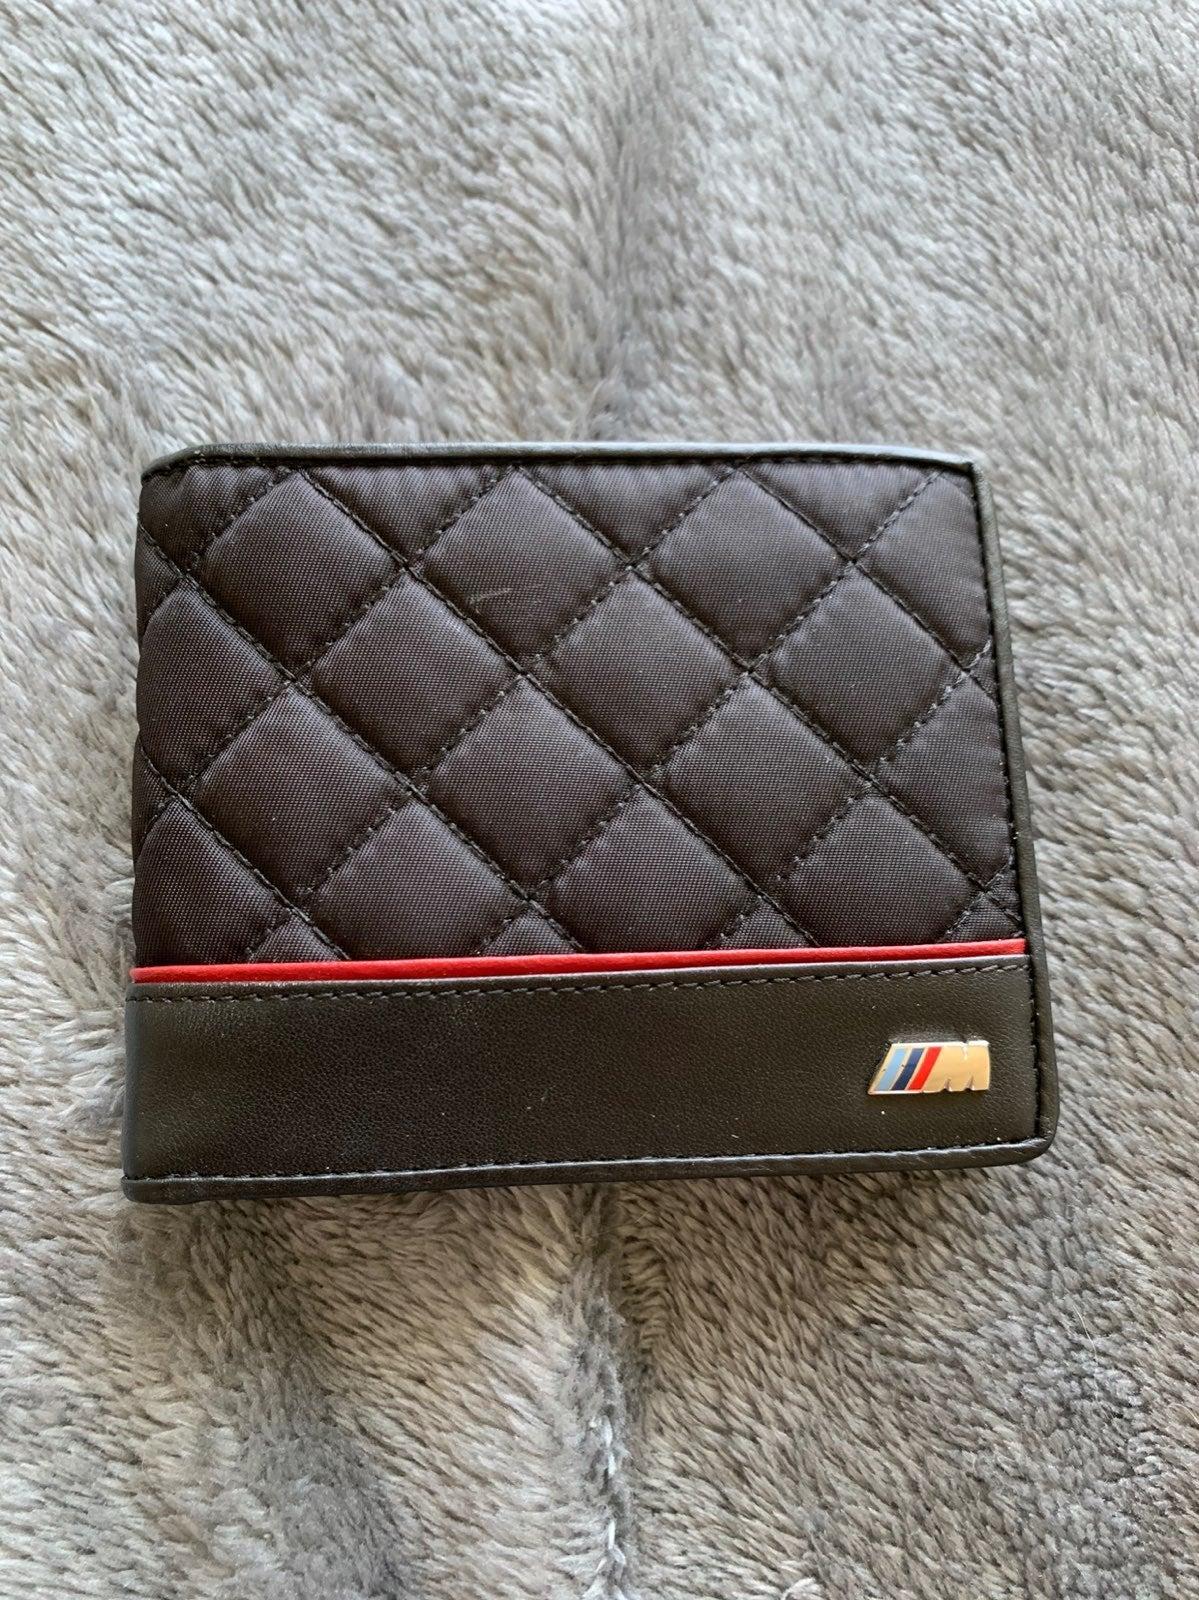 Bmw wallet